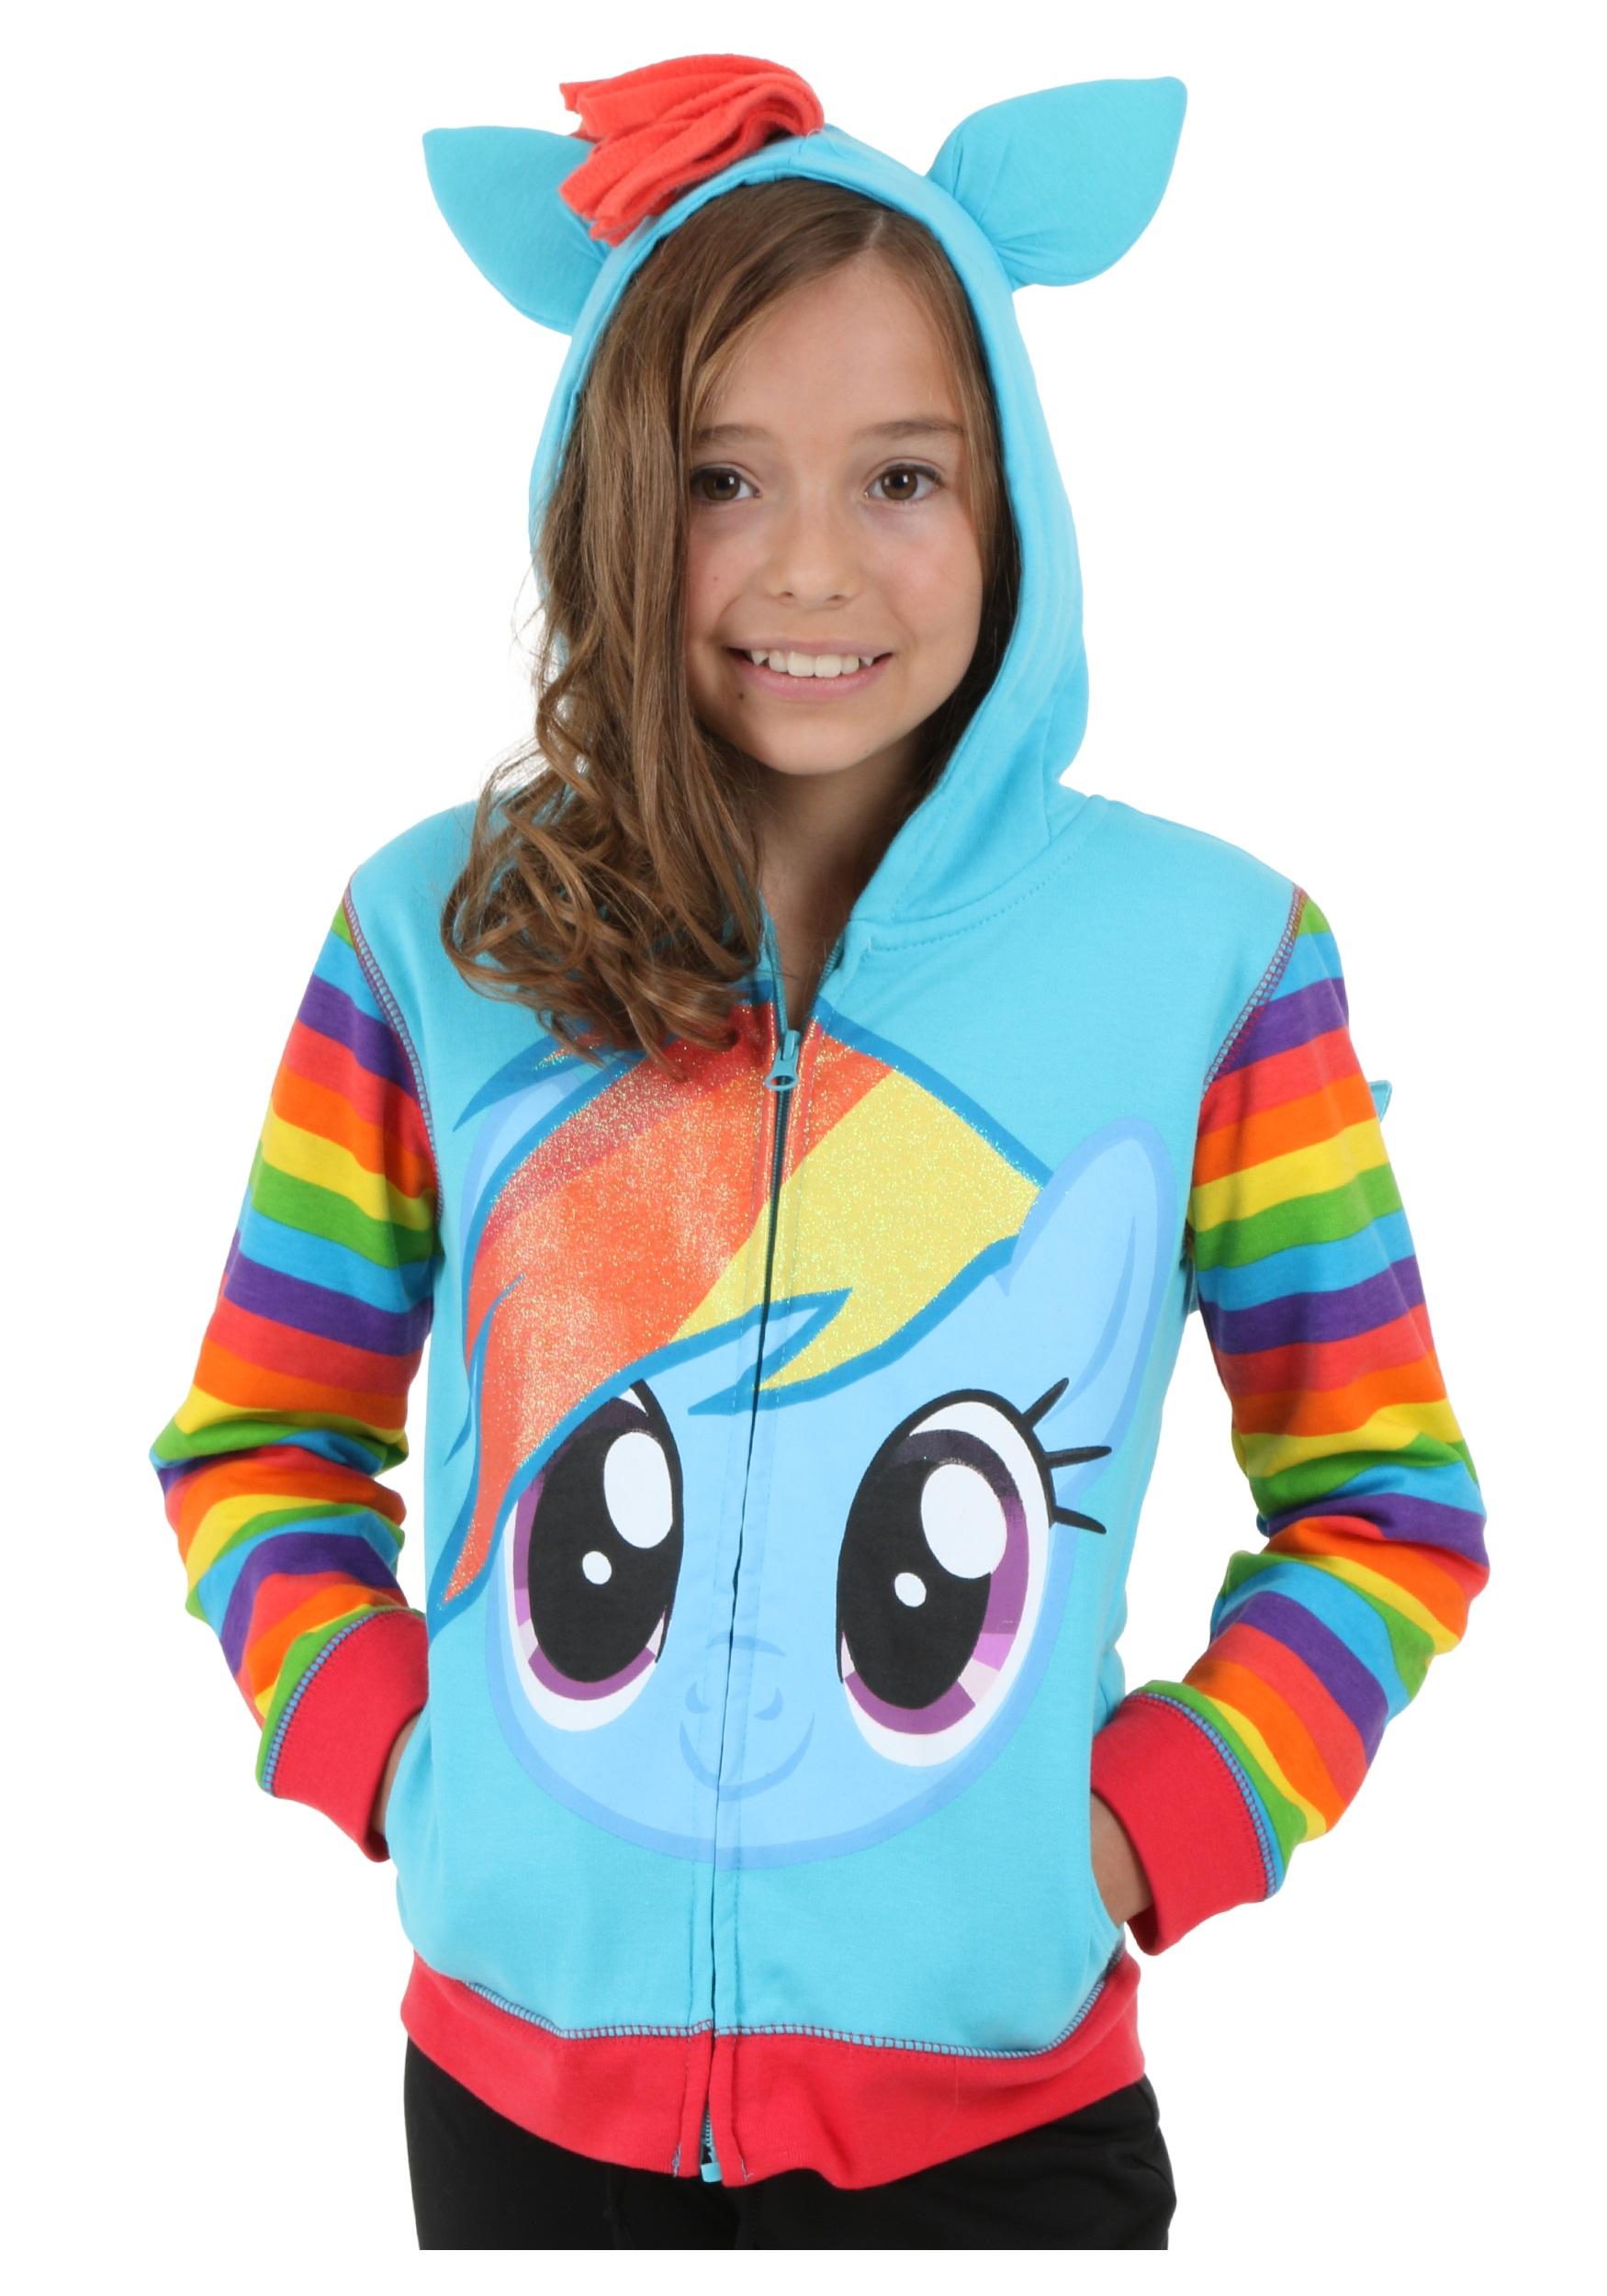 Girls Rainbow Dash Hoodie · Girls Rainbow Dash Hoodie Girls Rainbow Dash Hoodie Alt